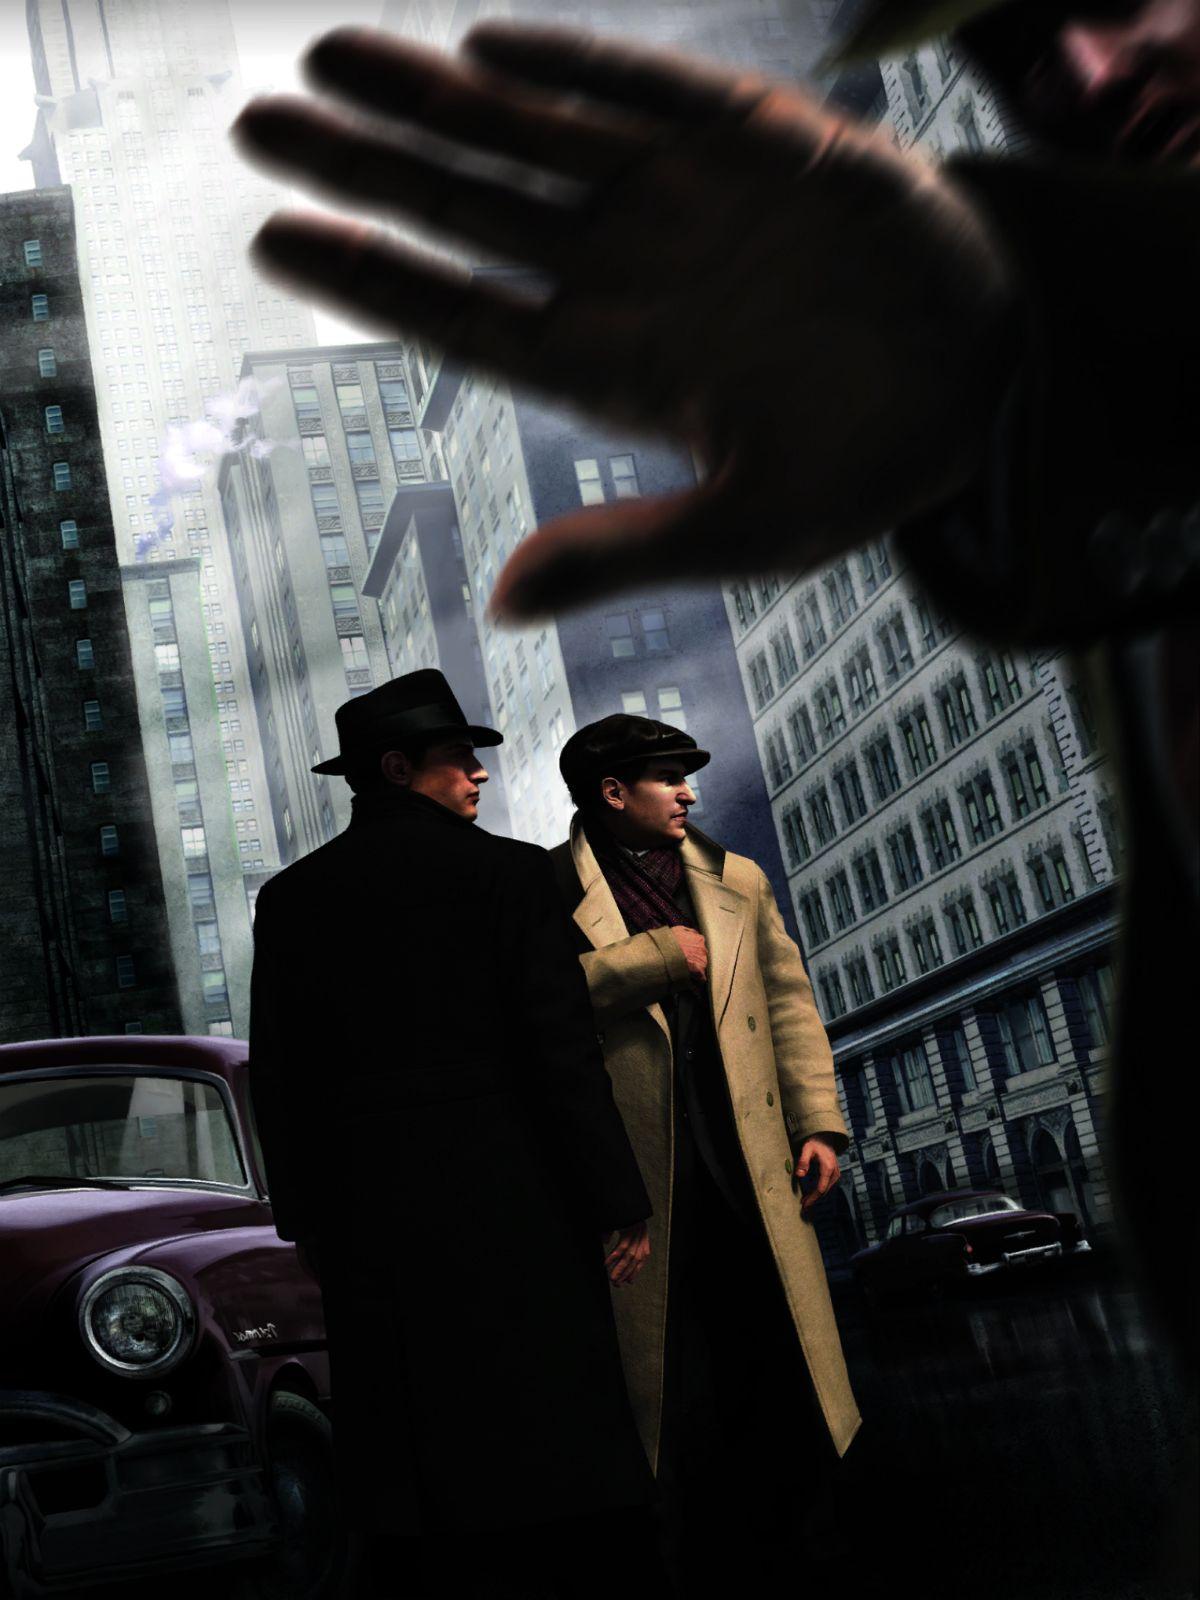 Did joe die in mafia 2